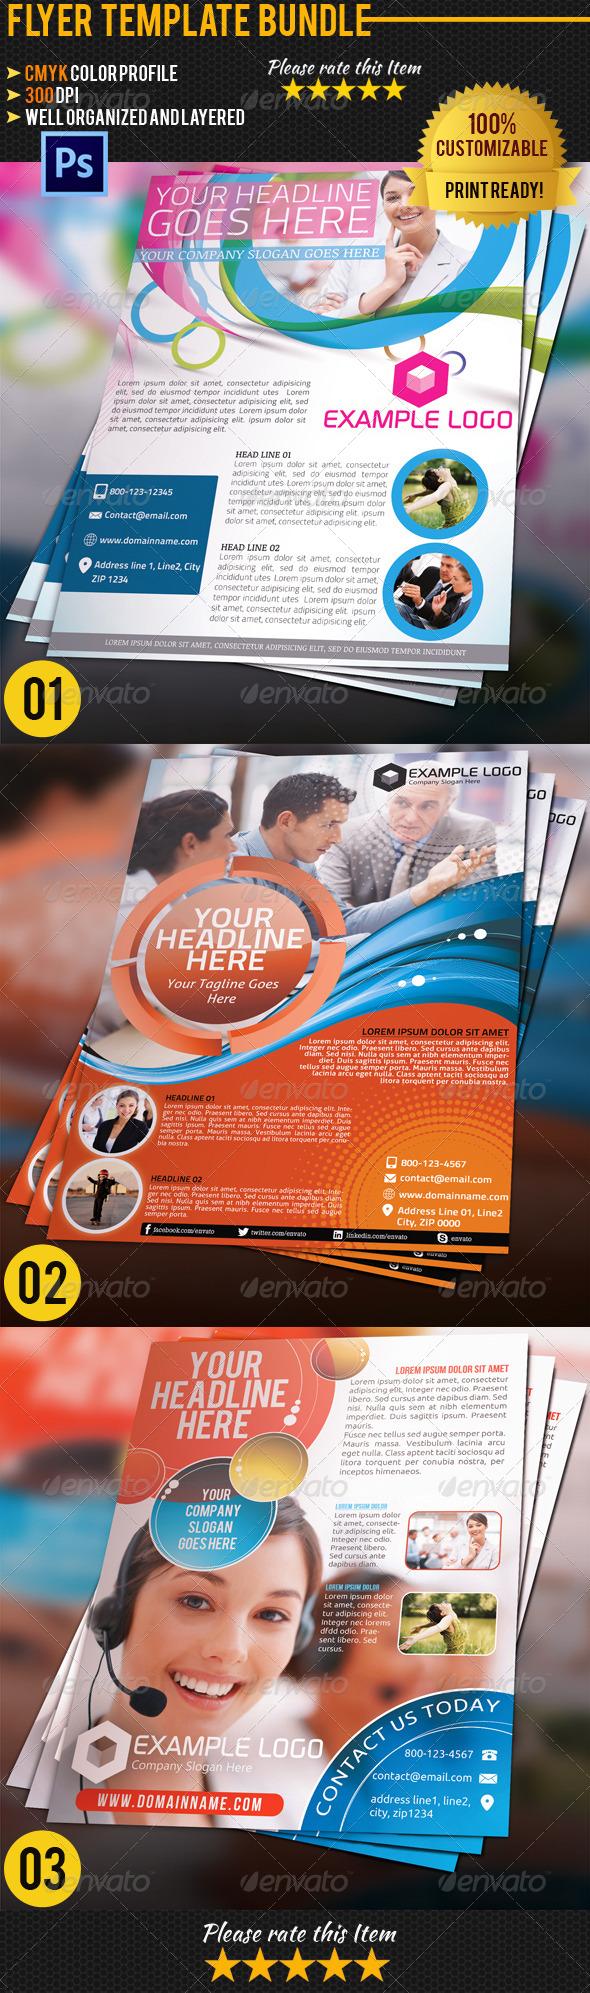 Corporate Business Flyer Bundle 01 - Corporate Flyers